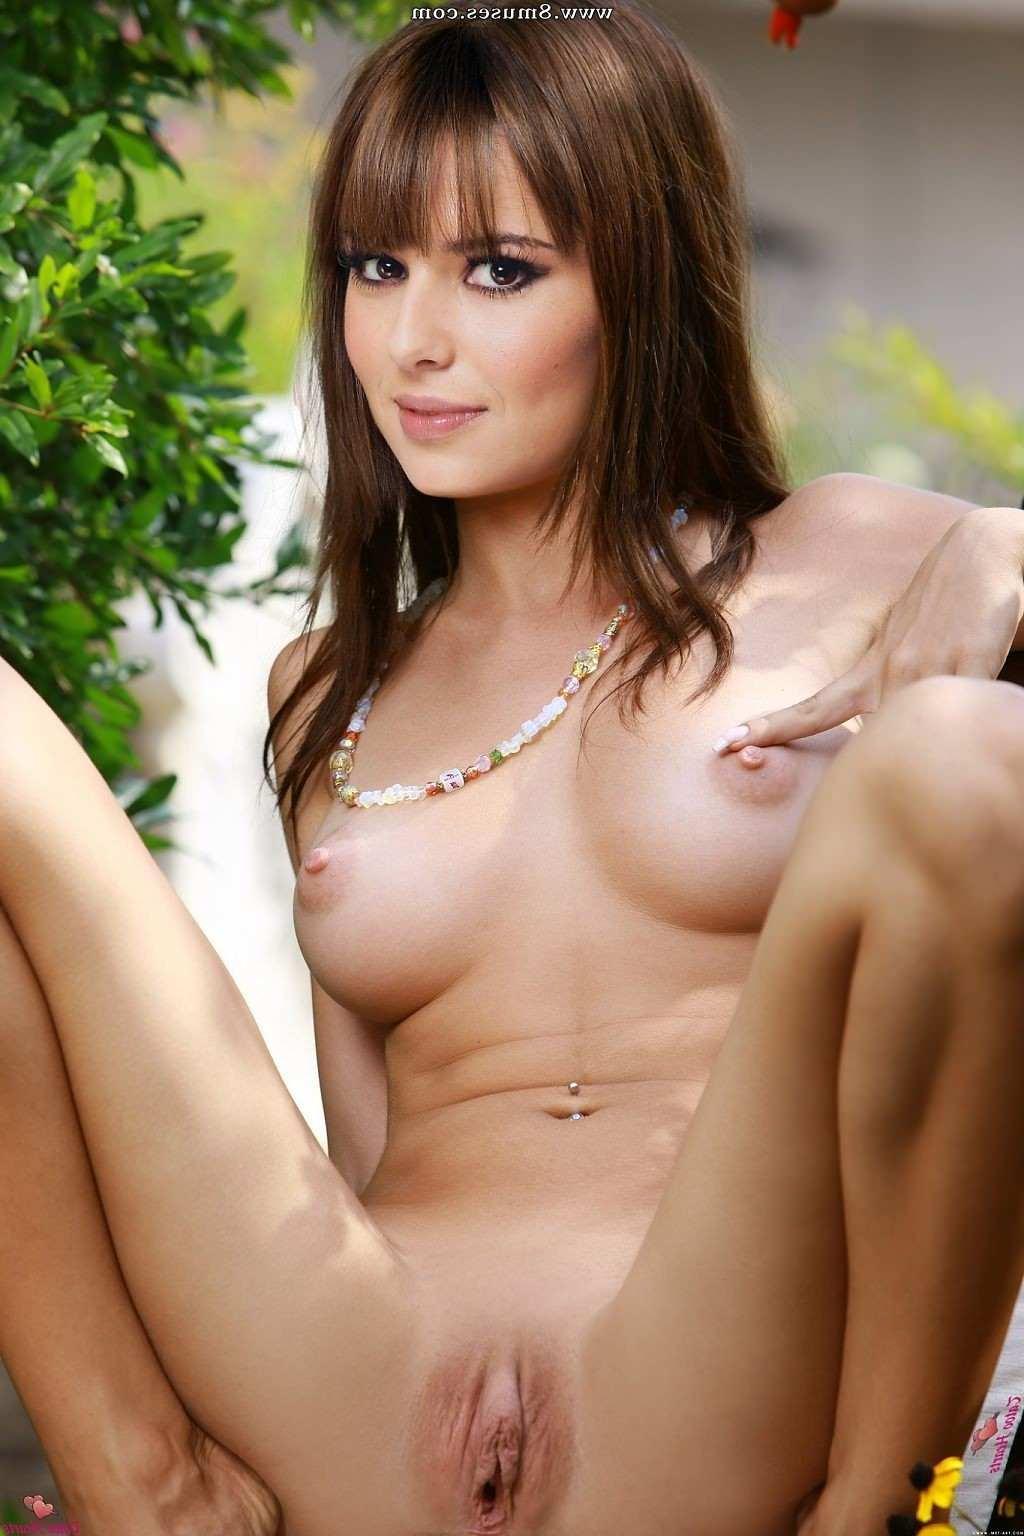 Fake-Celebrities-Sex-Pictures/Cheryl-Tweedy Cheryl__Tweedy__8muses_-_Sex_and_Porn_Comics_77.jpg